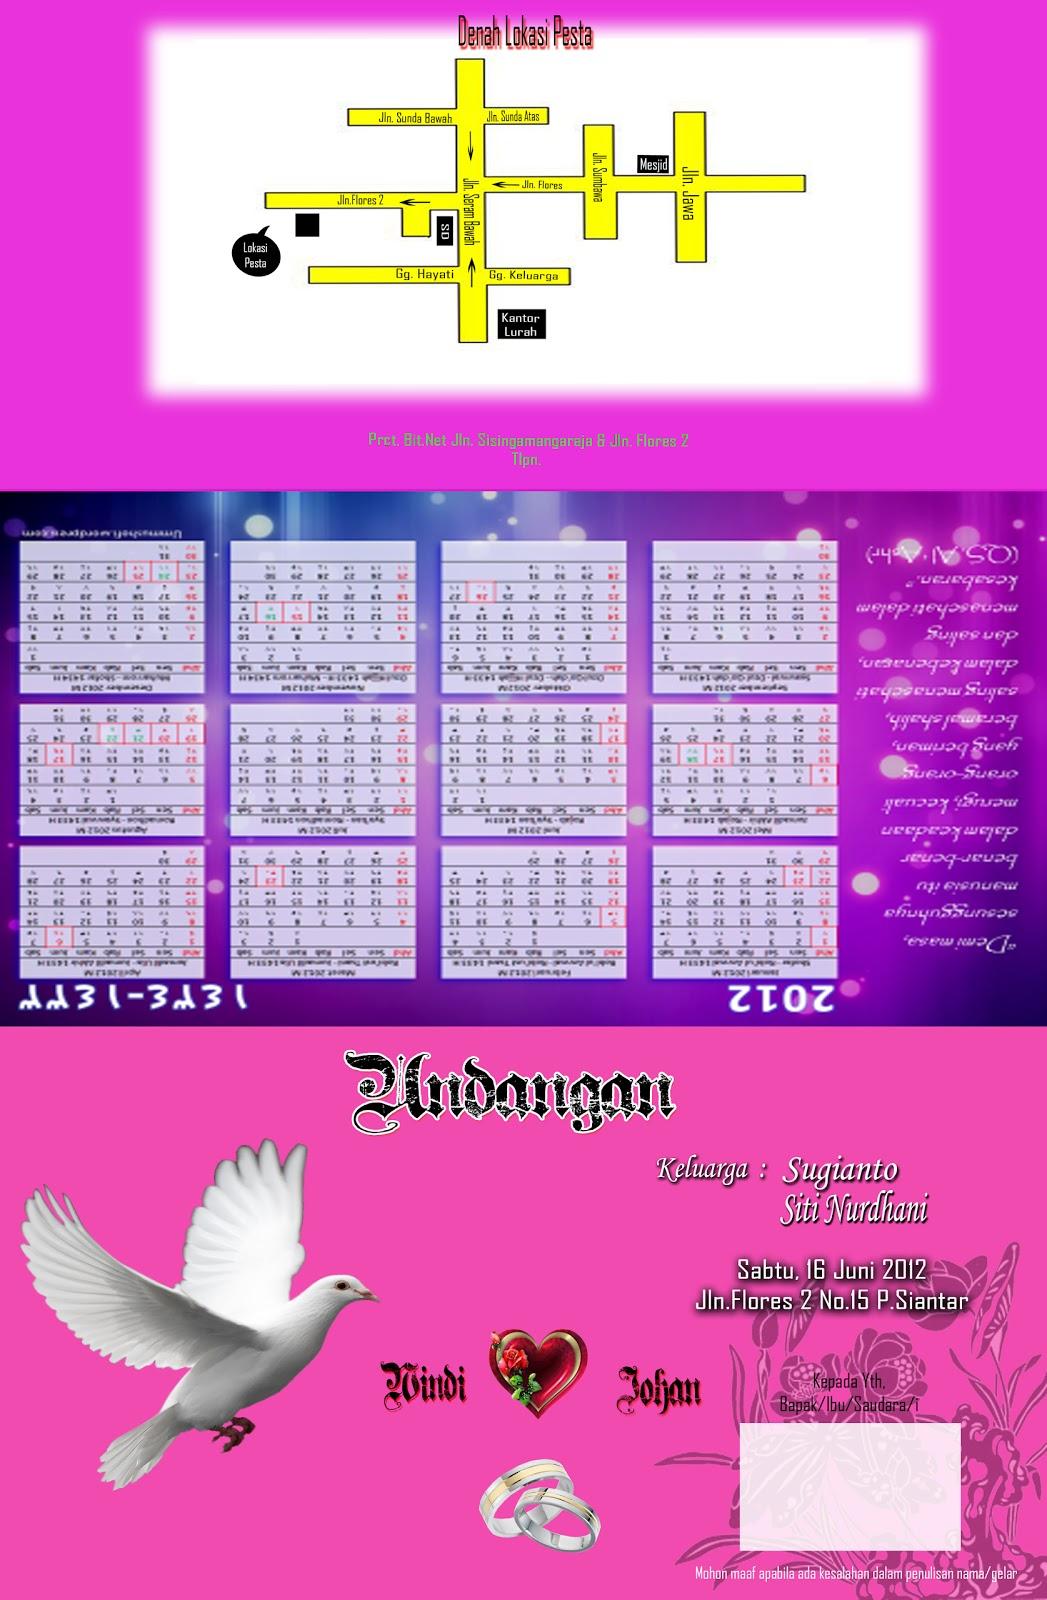 undangan kombinasi ungu dgn pink